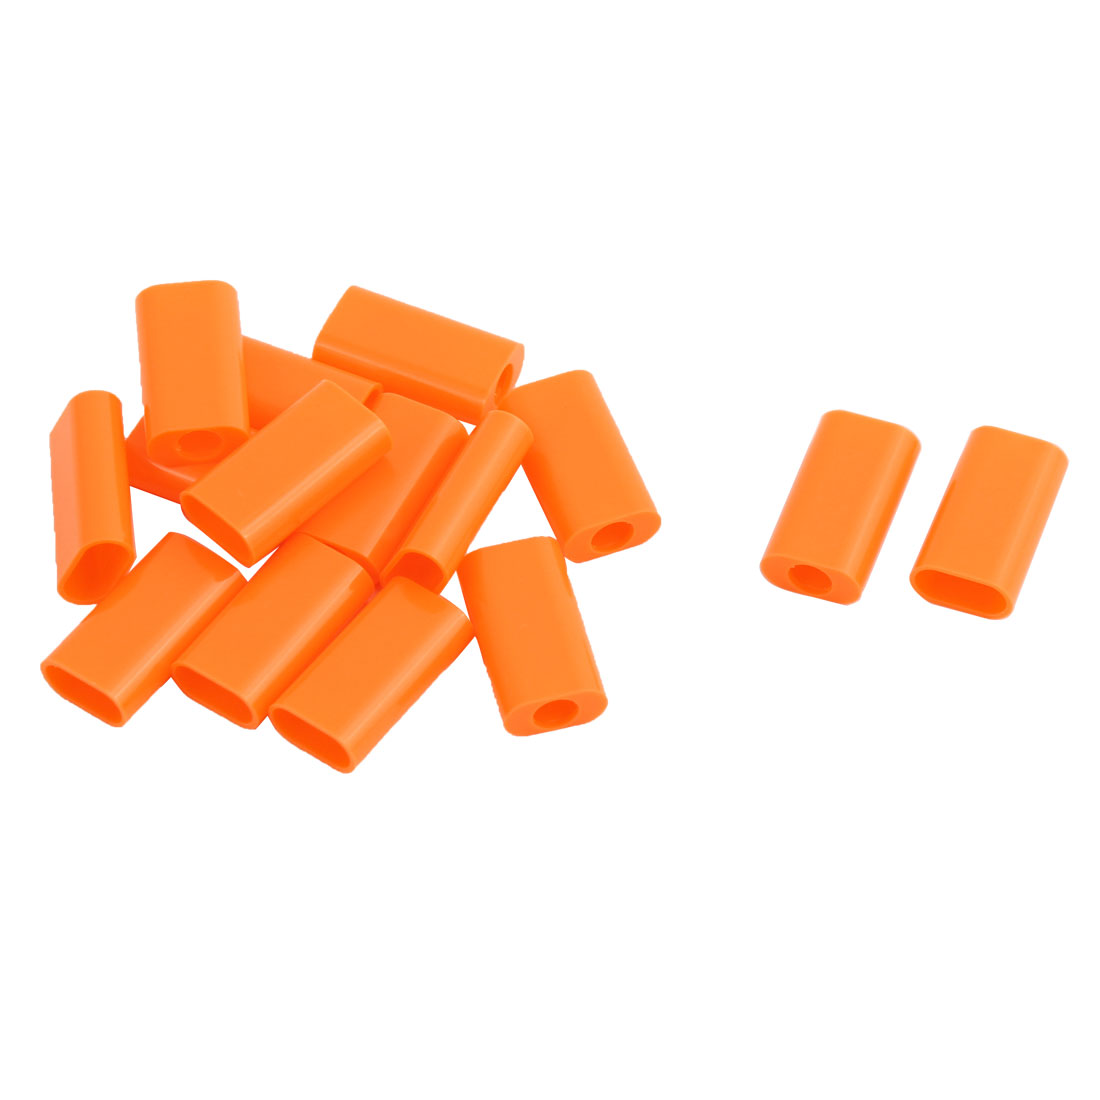 Plastic Rectangle Charge Linker USB Port Connector Shell Parts Orange 16x9x5mm 15 PCS